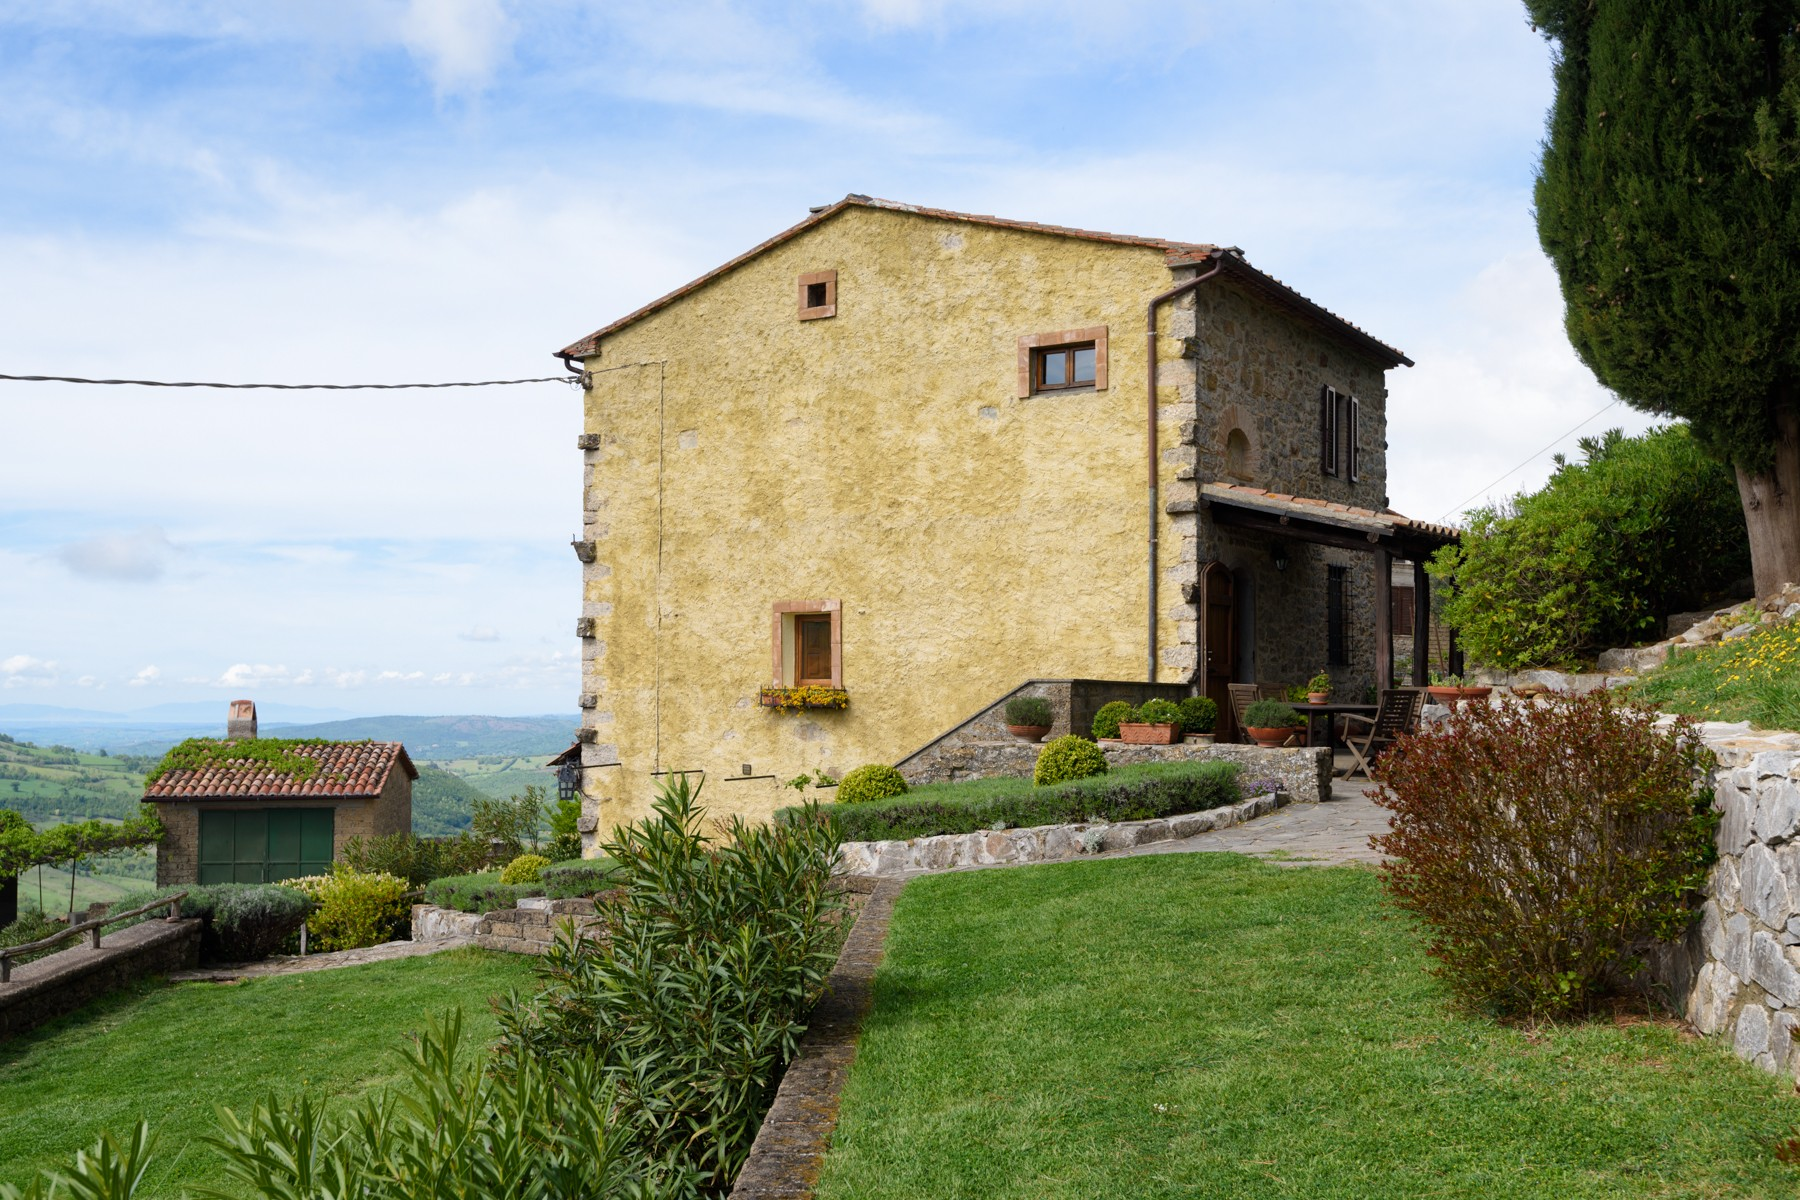 Casa indipendente in Vendita a Semproniano: 4 locali, 220 mq - Foto 4